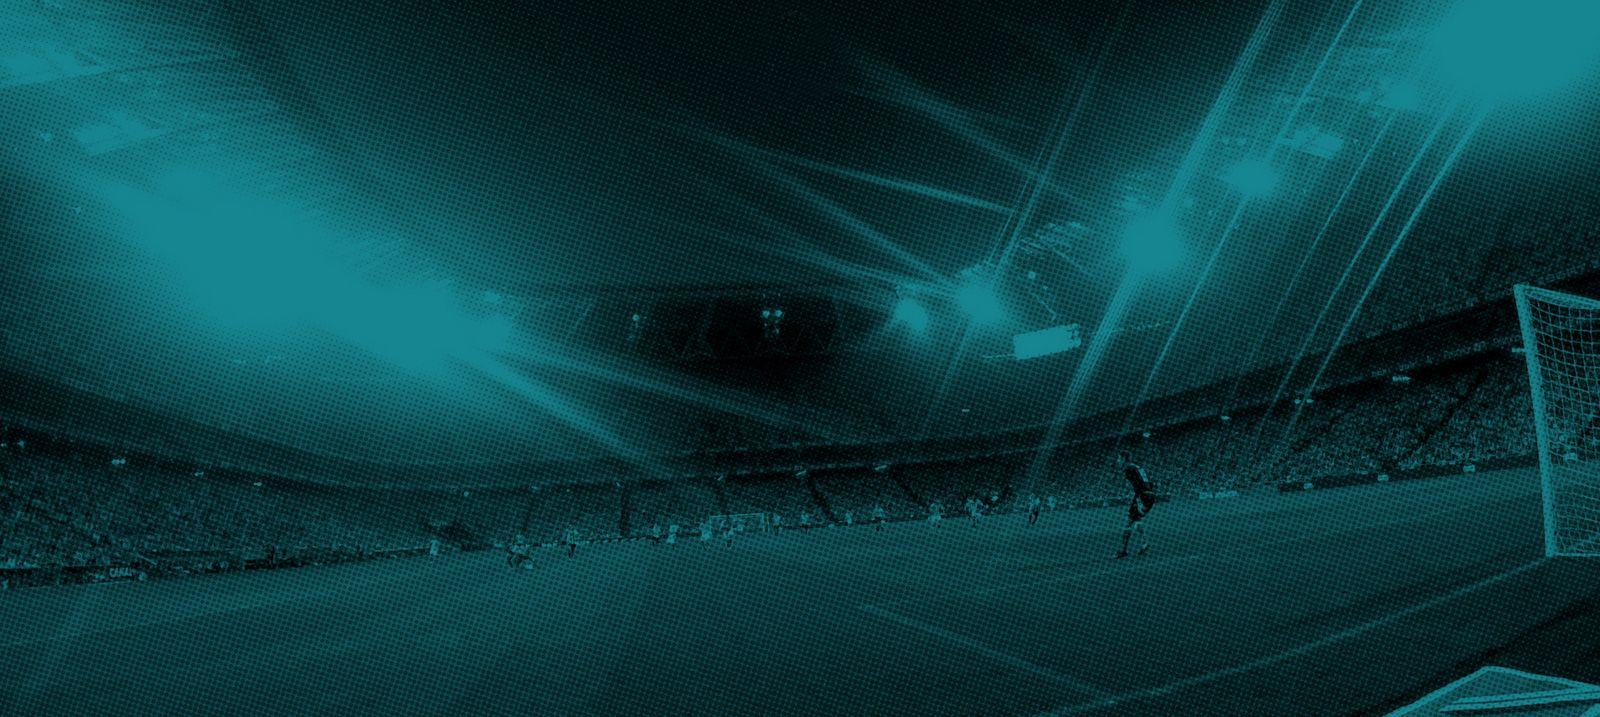 Foto: Fondo fútbol genérico